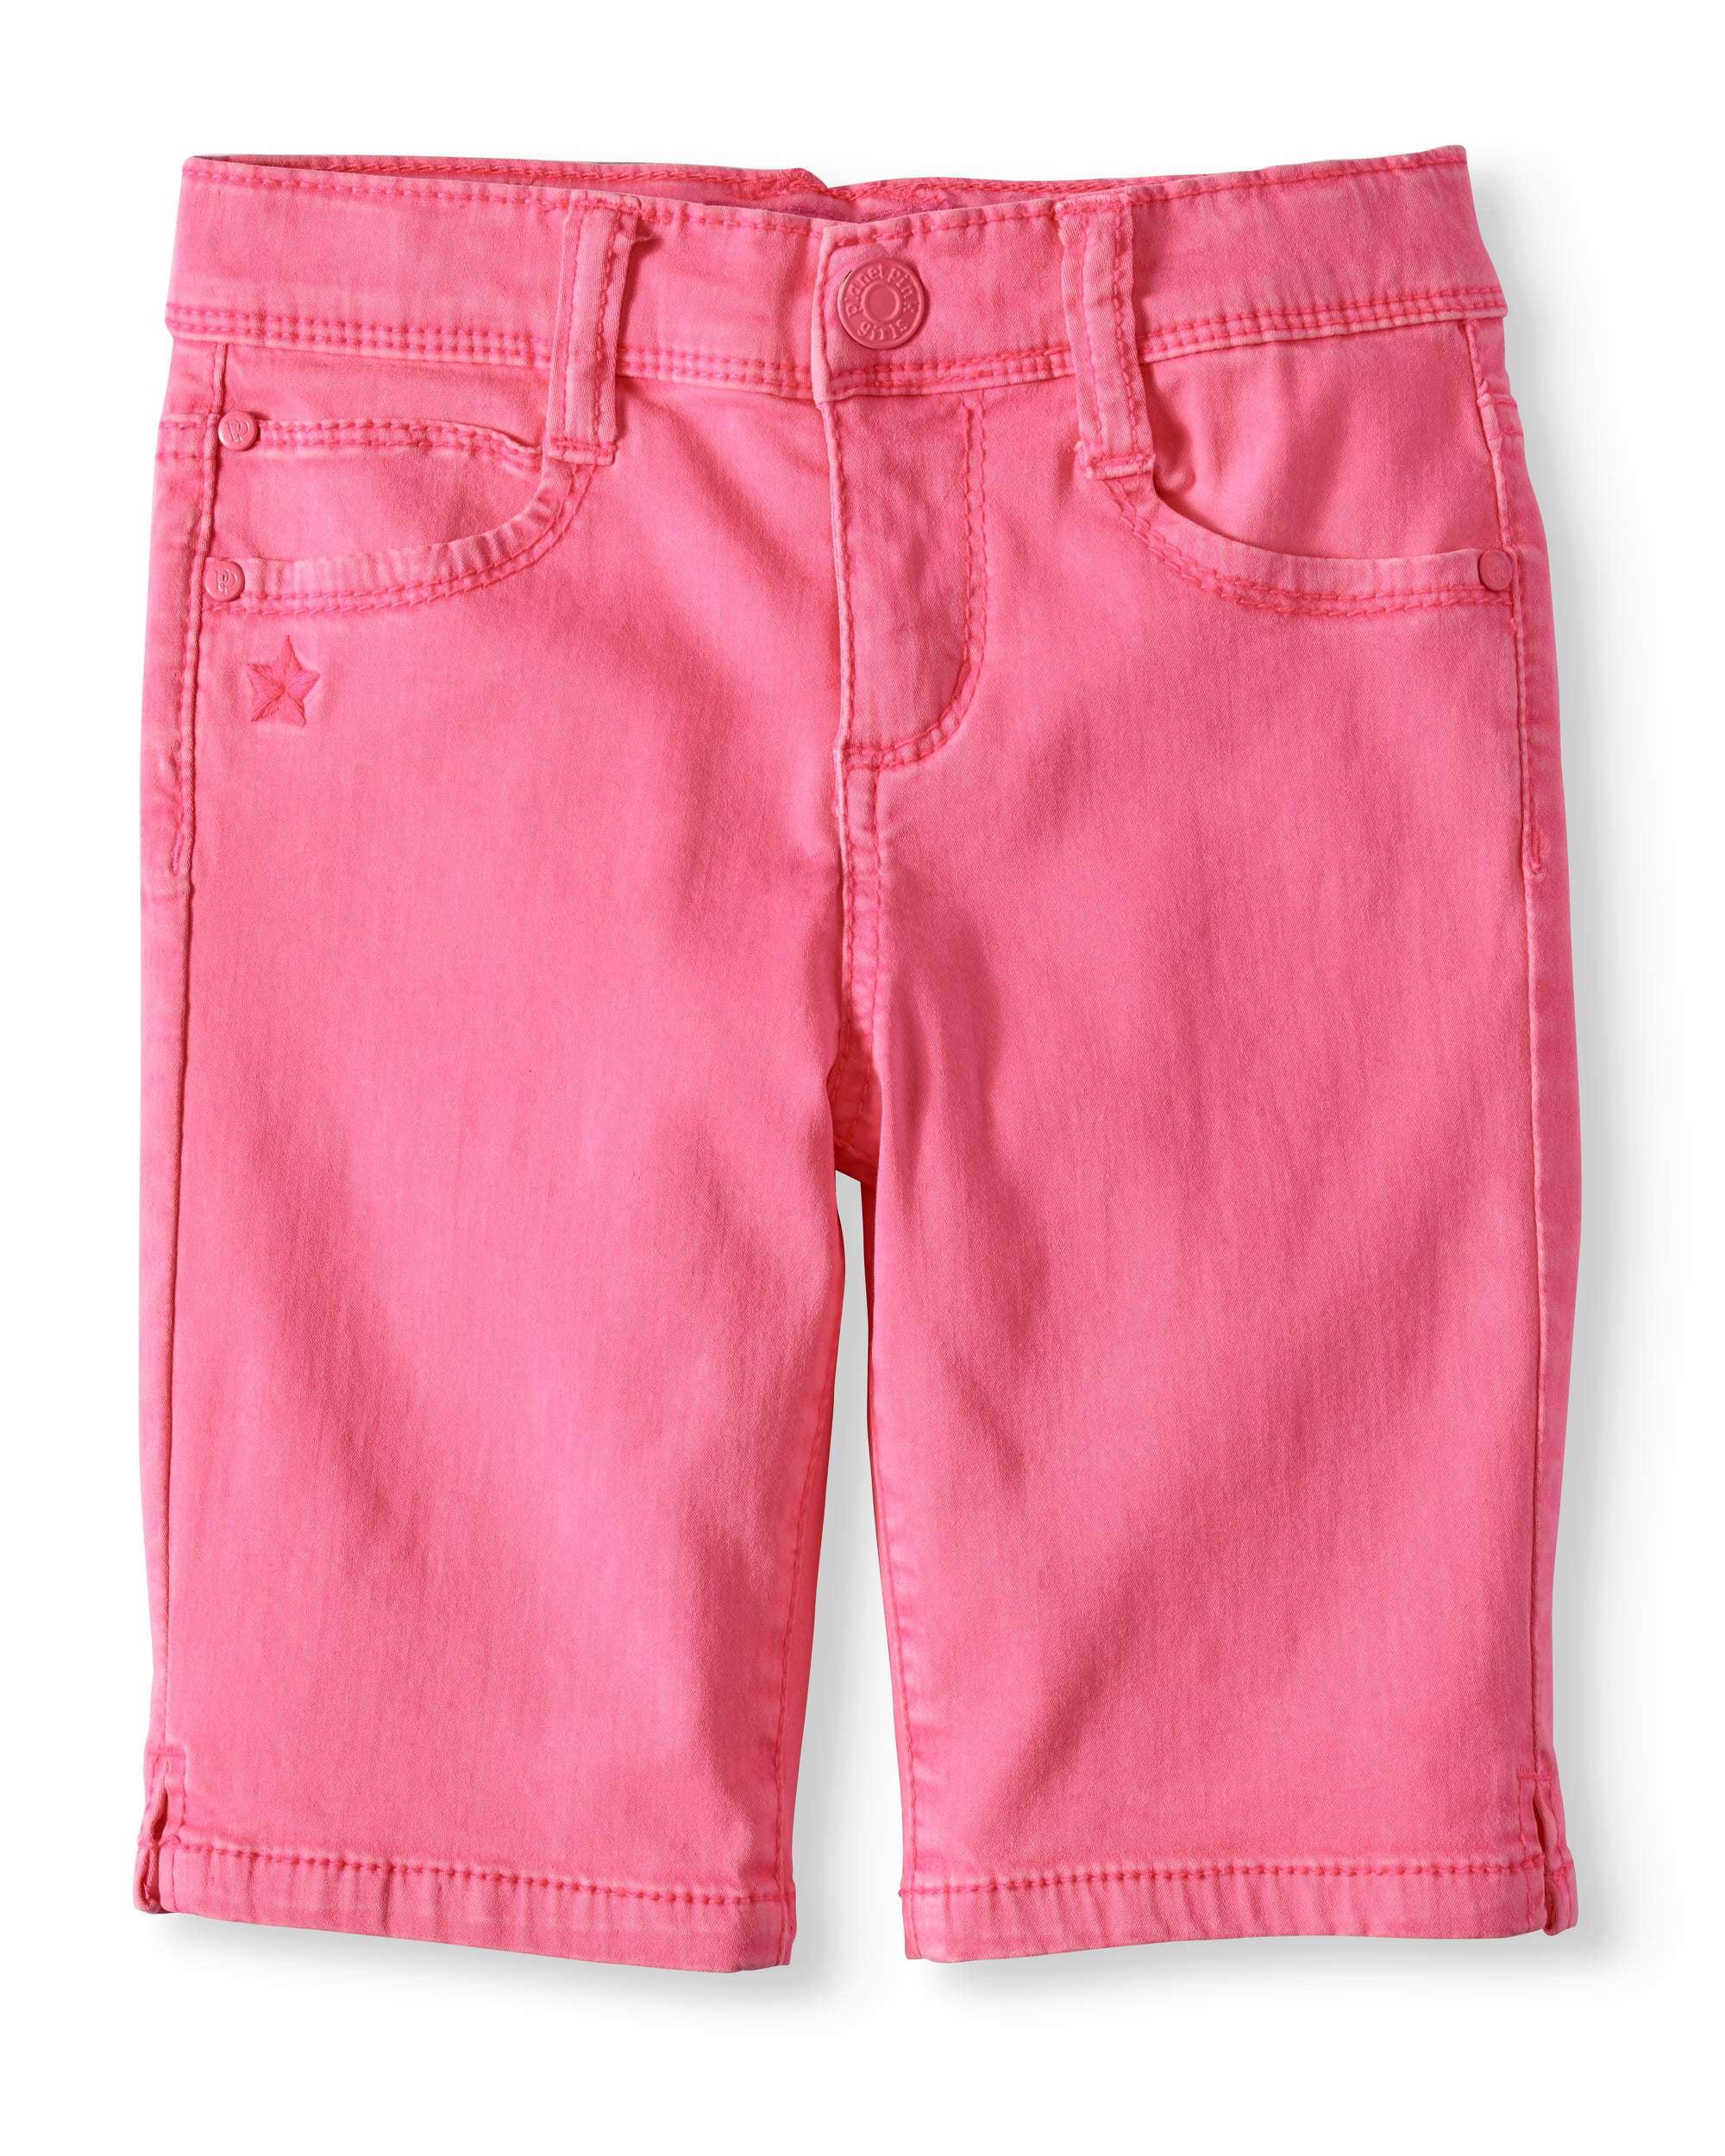 LIttle Girls' 4-6X Super Soft Twill Bermuda Short